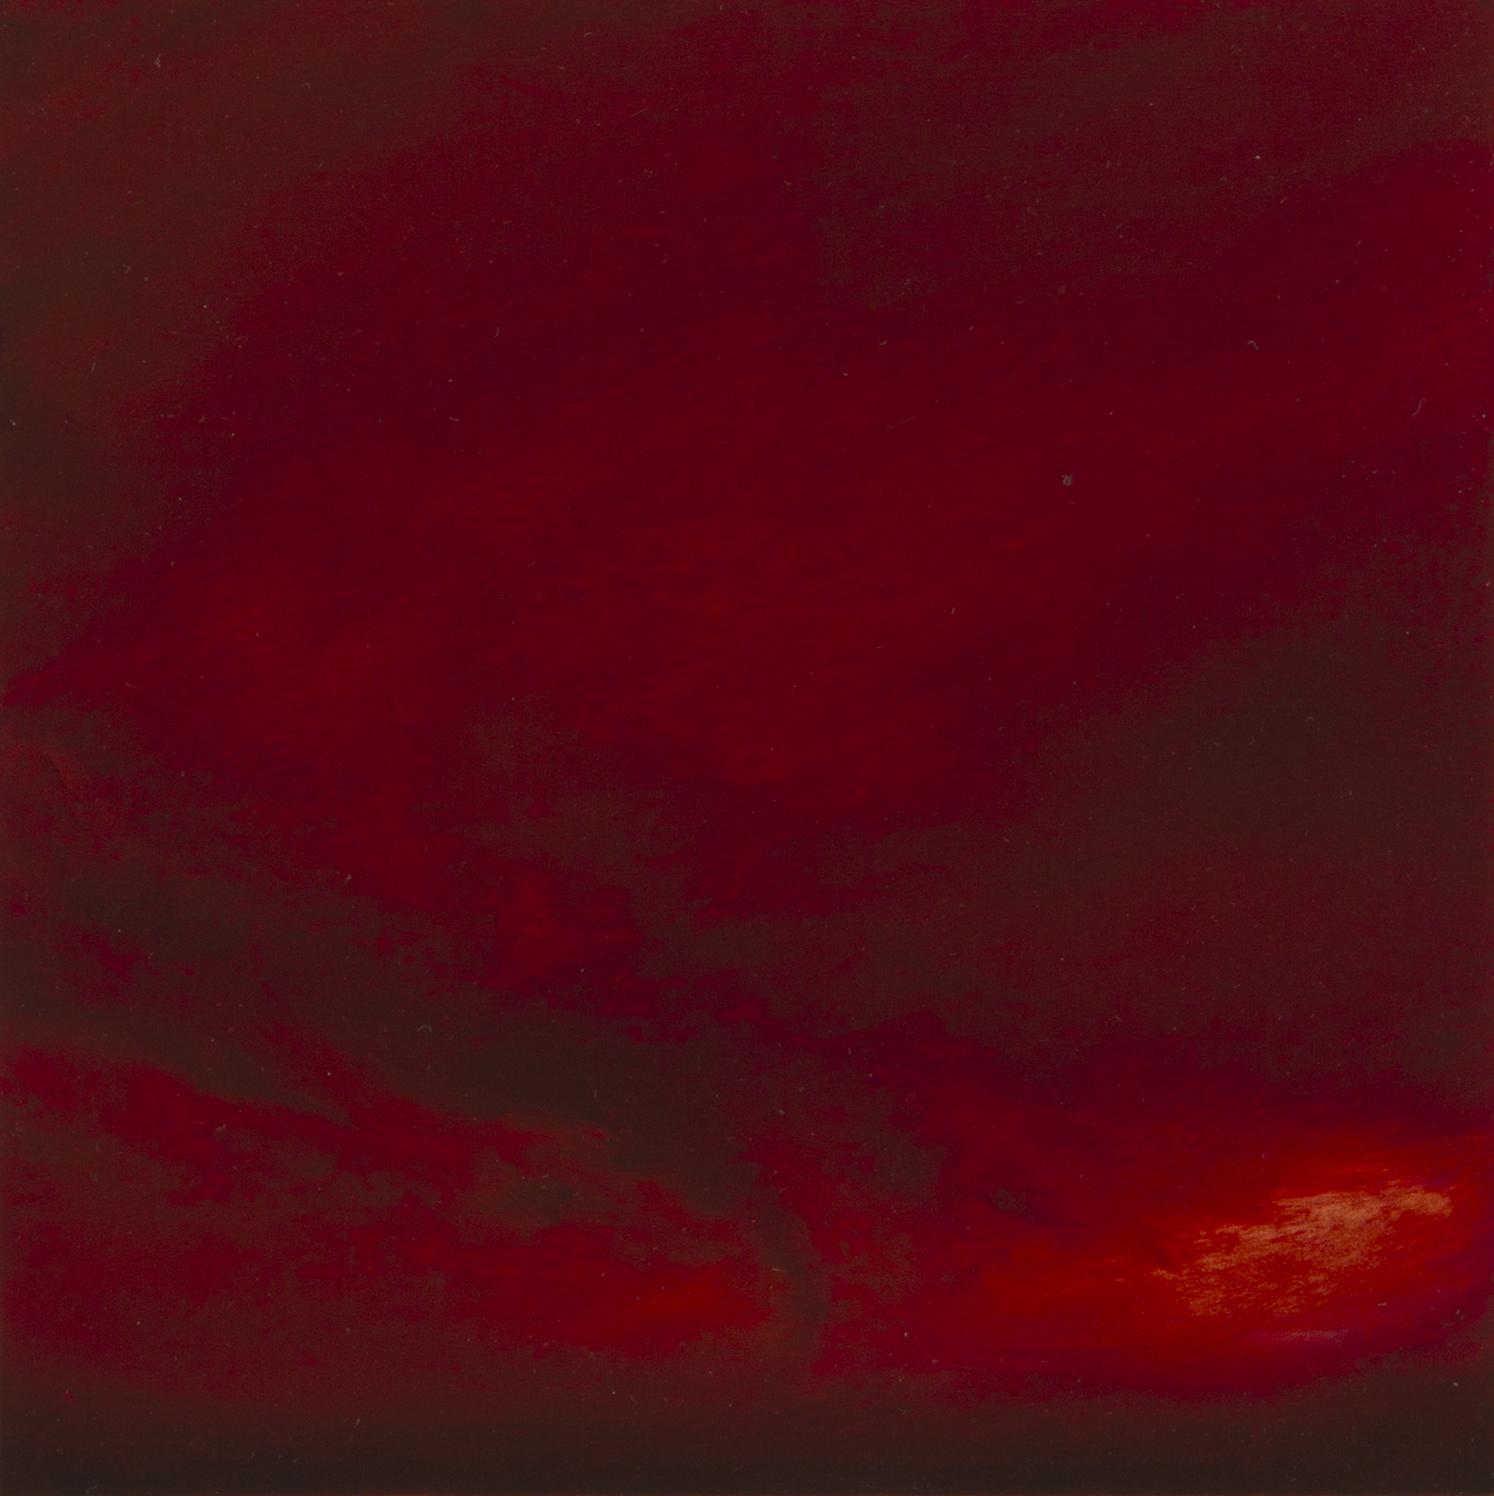 Red Tornado 10